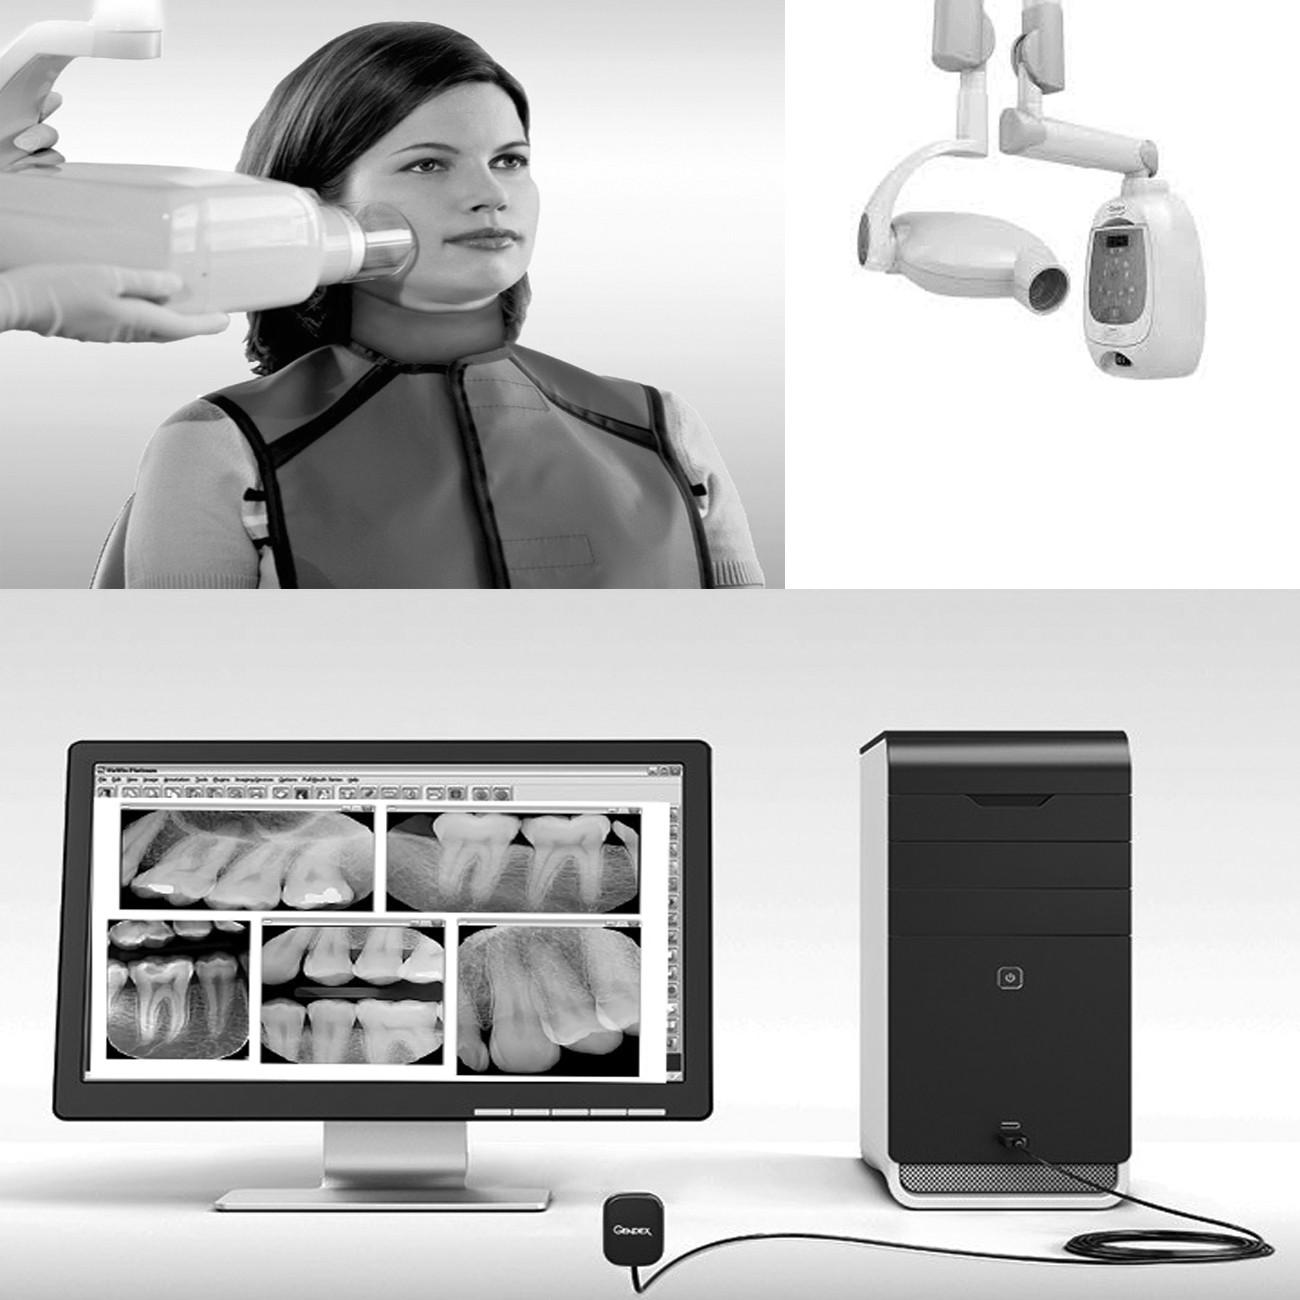 Gendex Intraoral Digital X Ray